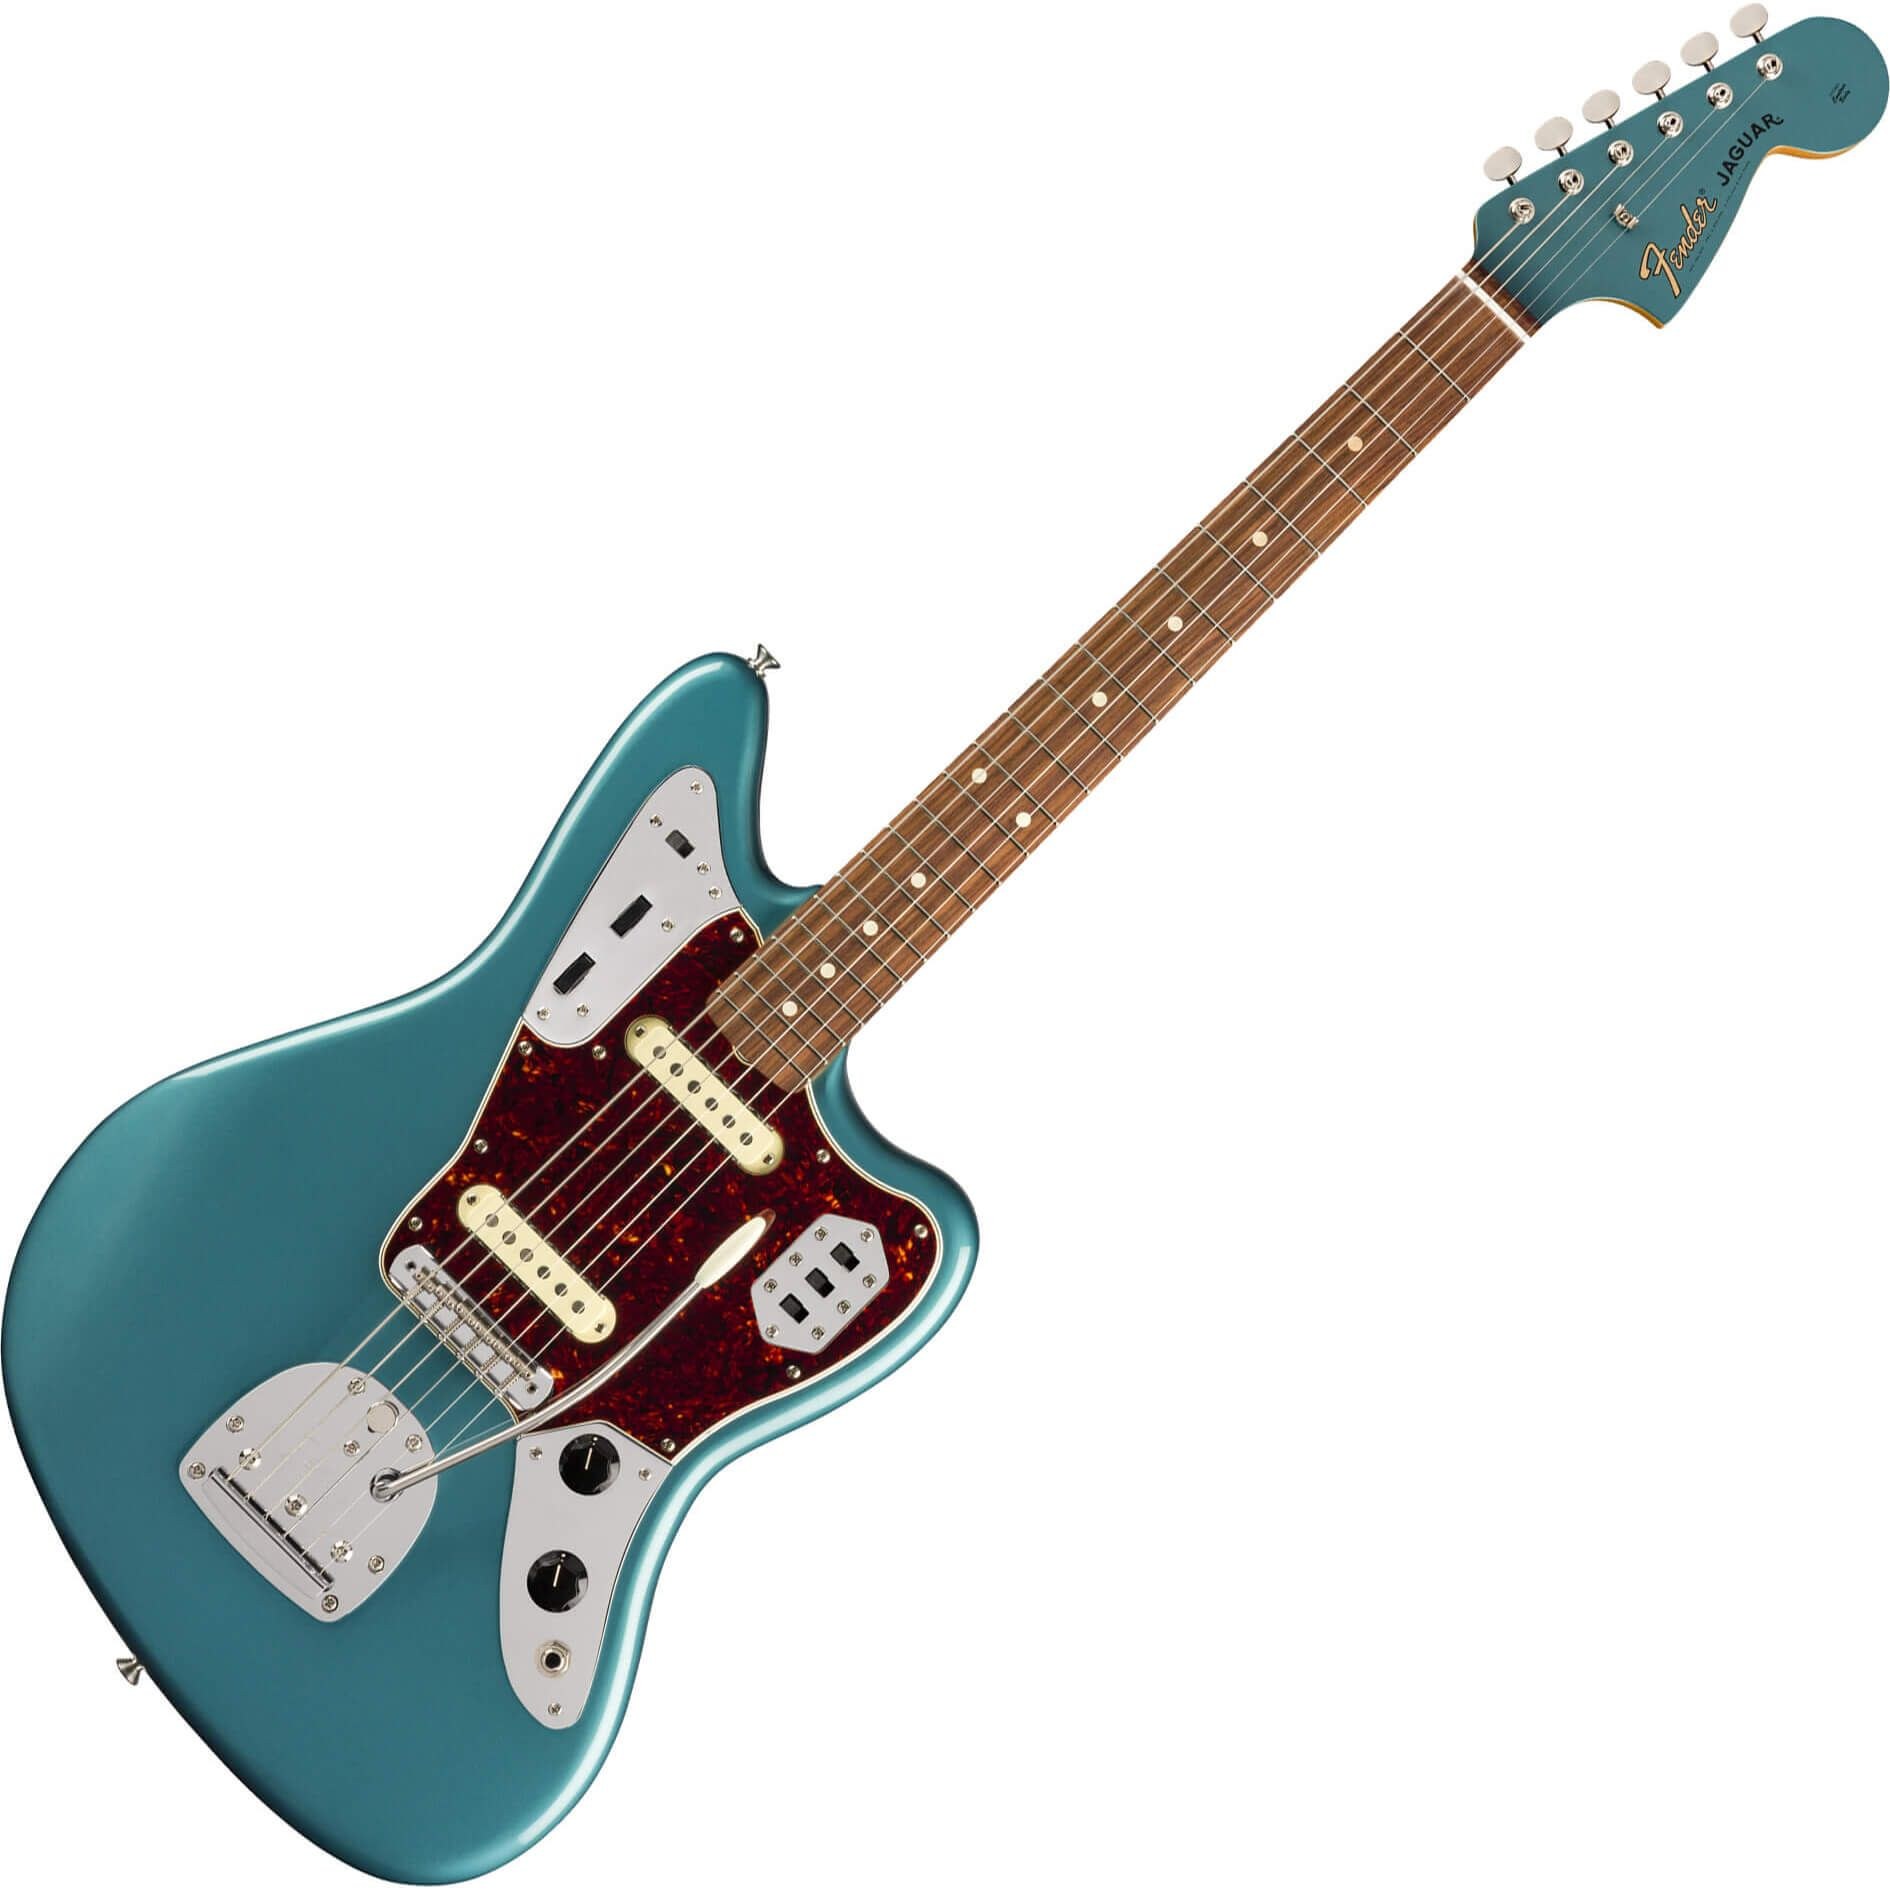 Fender Vintera Series 60s Jaguar - PF - Ocean Turquoise